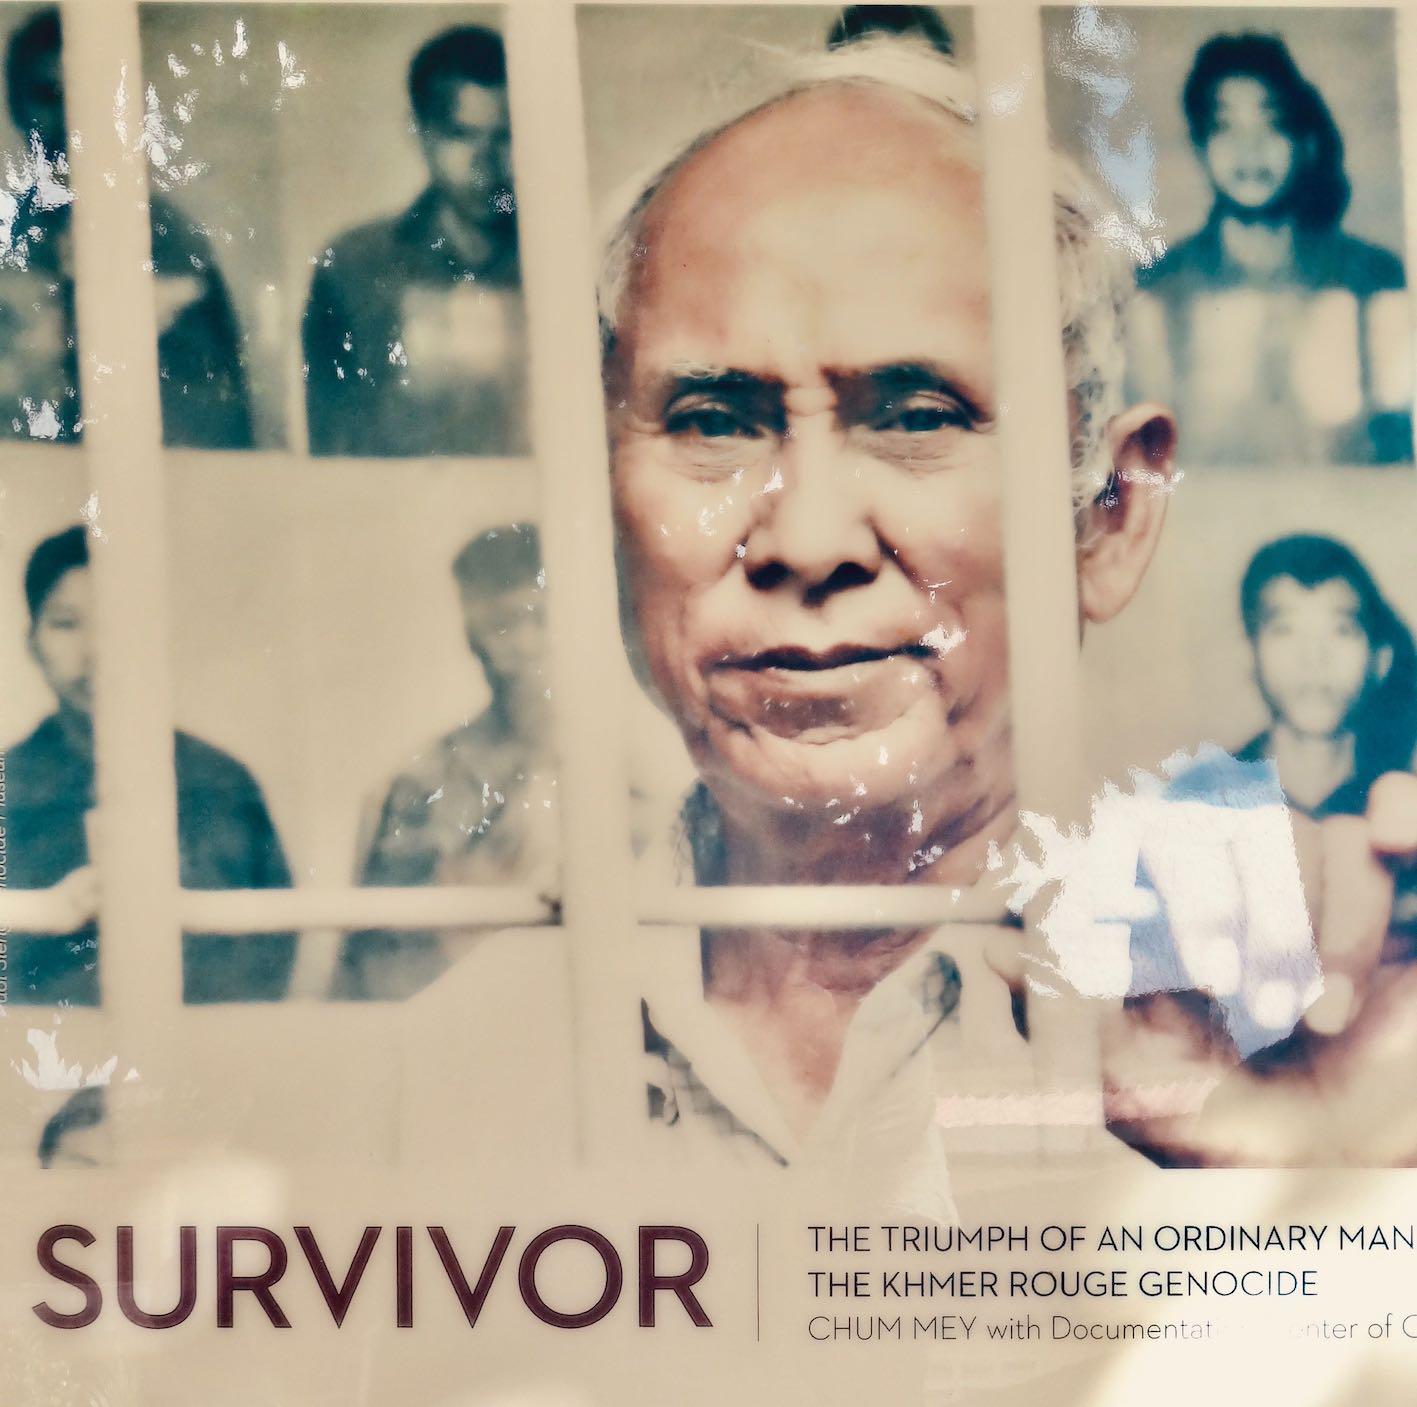 Chum Mey Cambodian genocide survivor